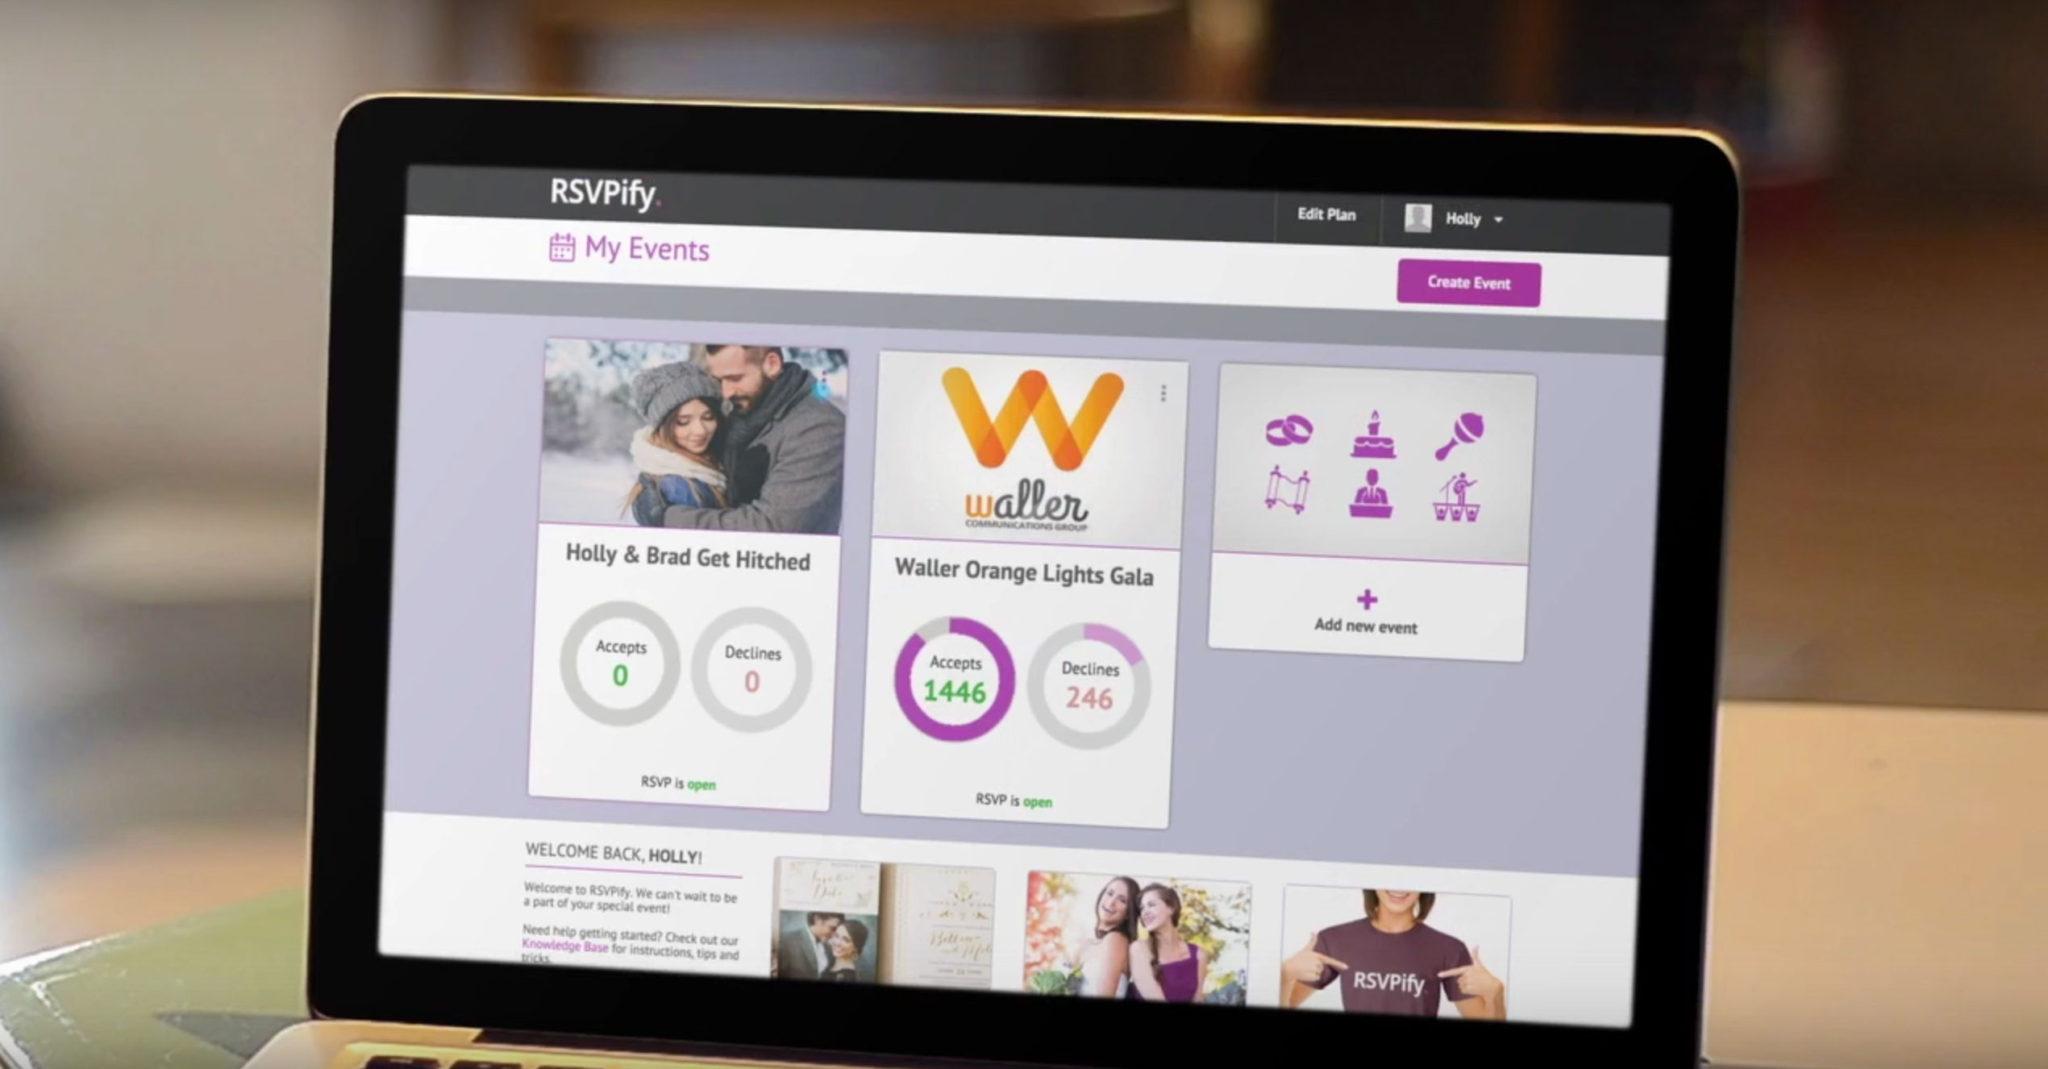 RSVPify's online RSVP dashboard screen